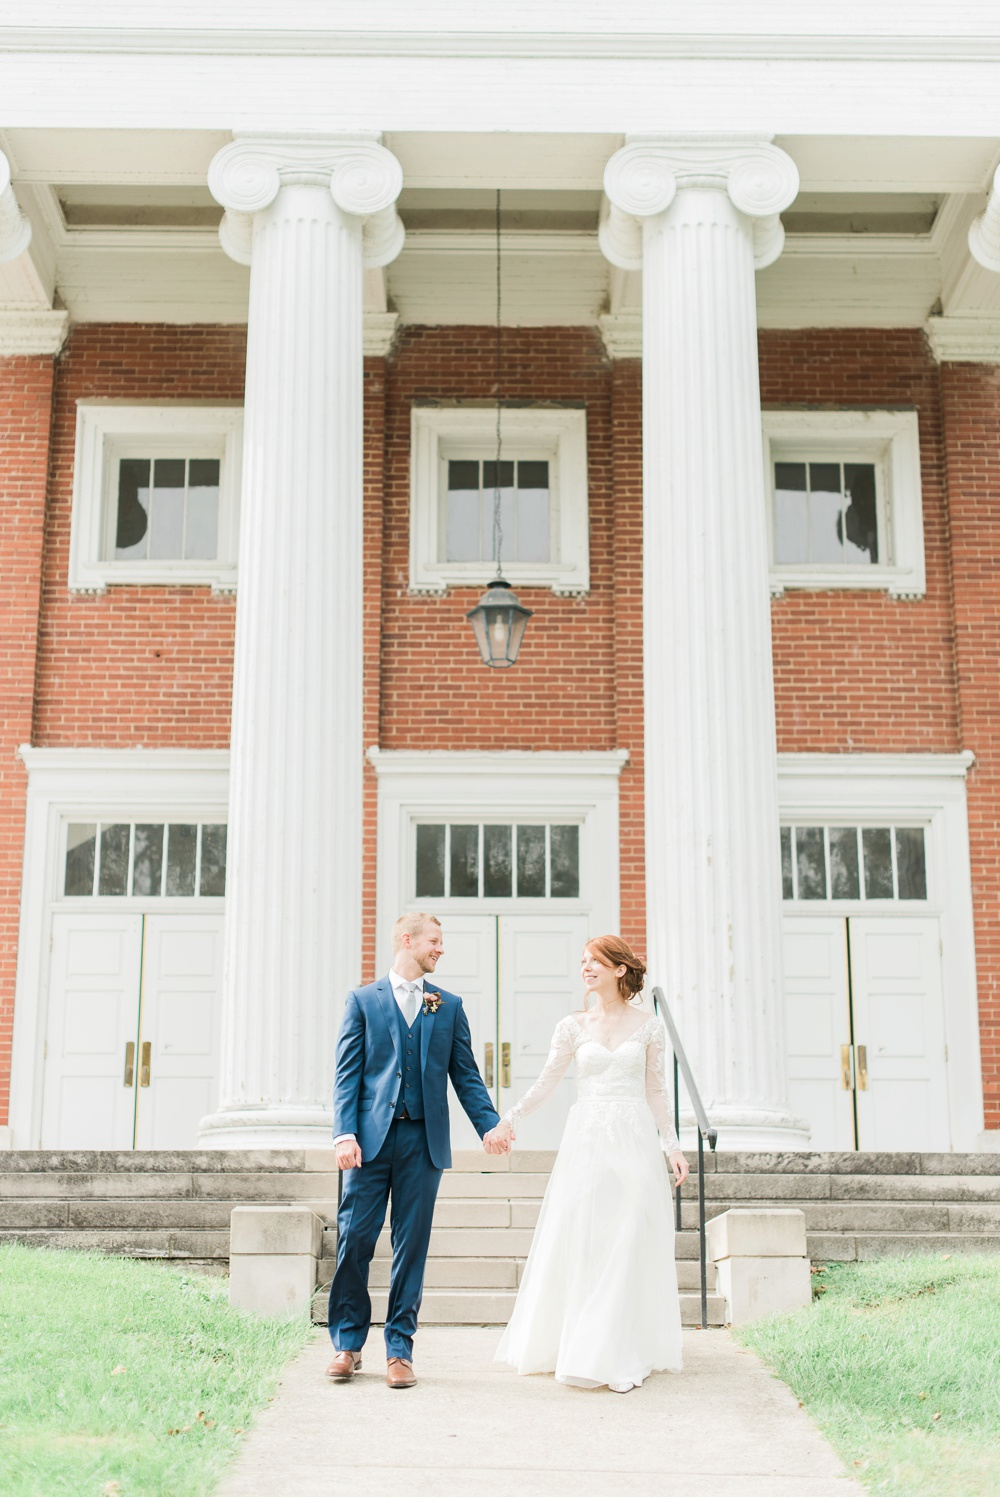 ohio-university-walter-hall-wedding-athens-anna-mark_0077.jpg